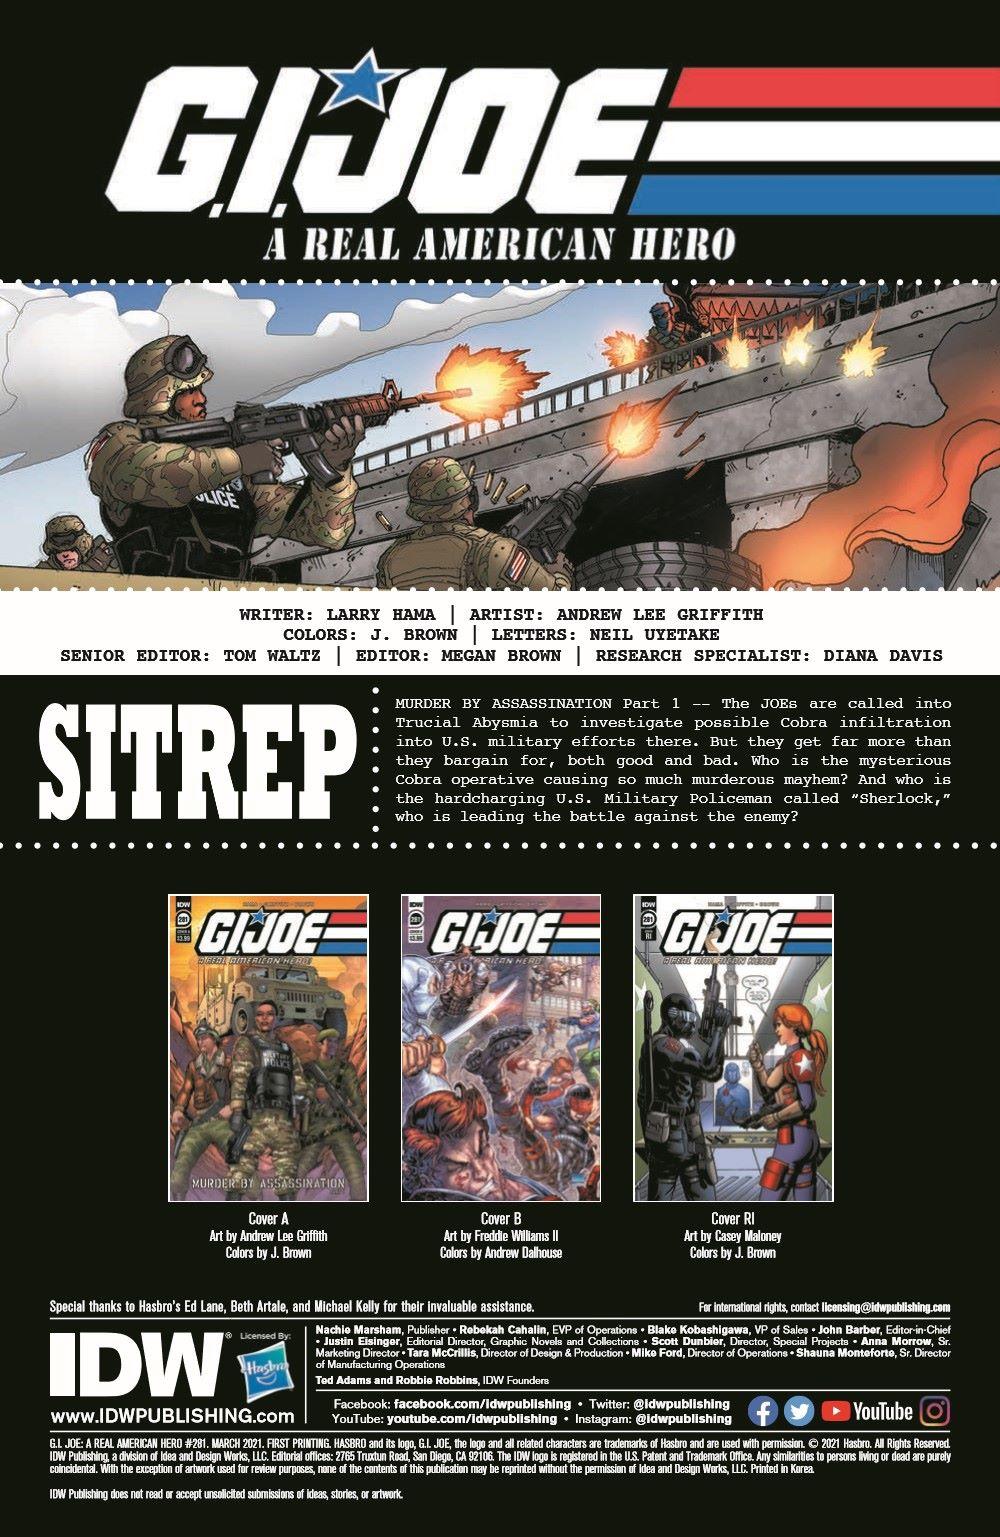 GIJoeRAH281-pr-2 ComicList Previews: G.I. JOE A REAL AMERICAN HERO #281